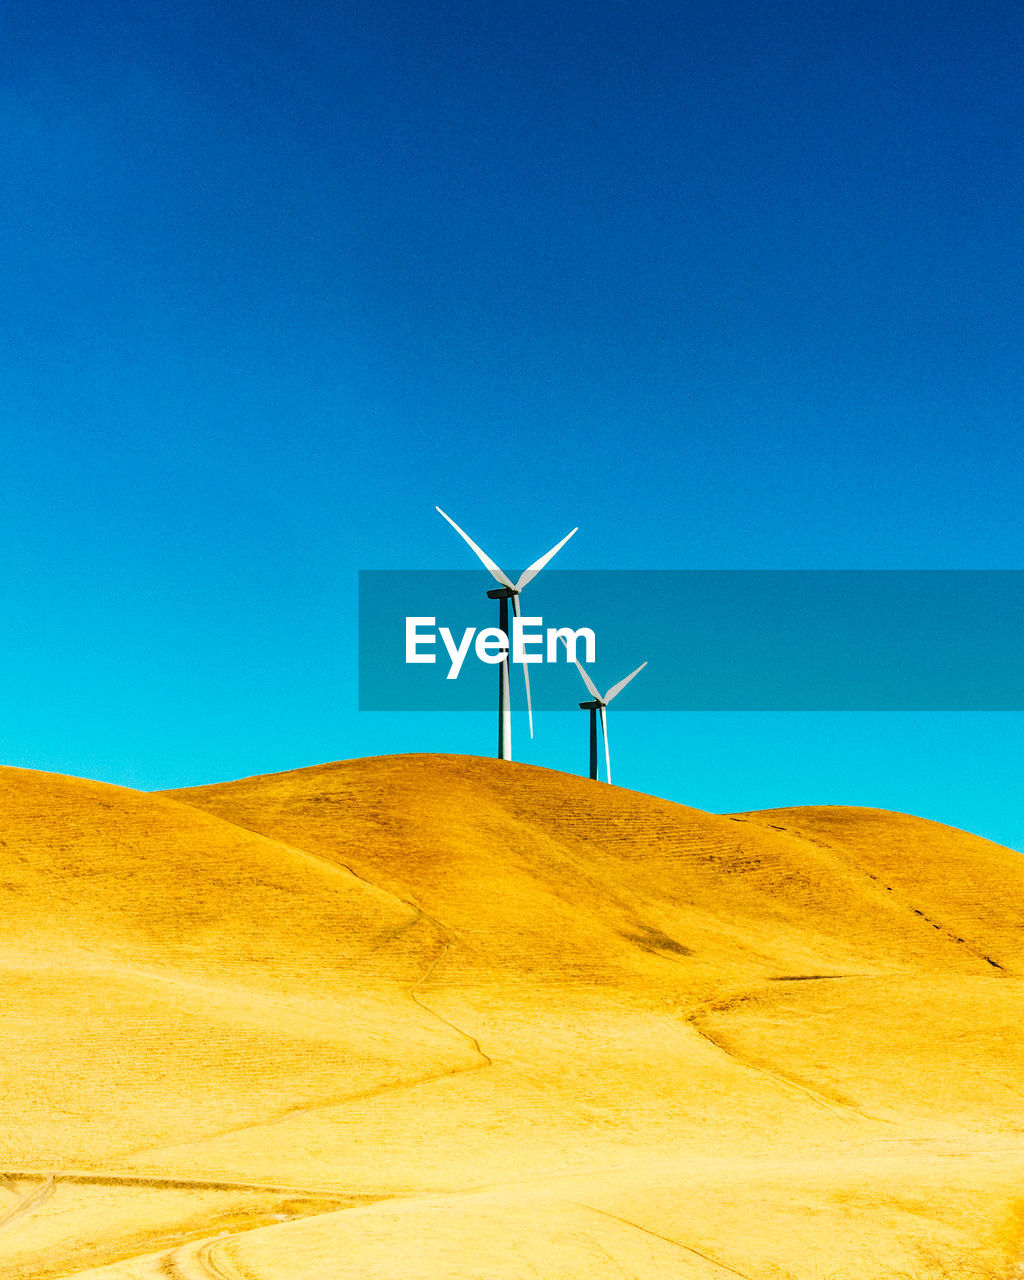 Windmill on desert against clear blue sky